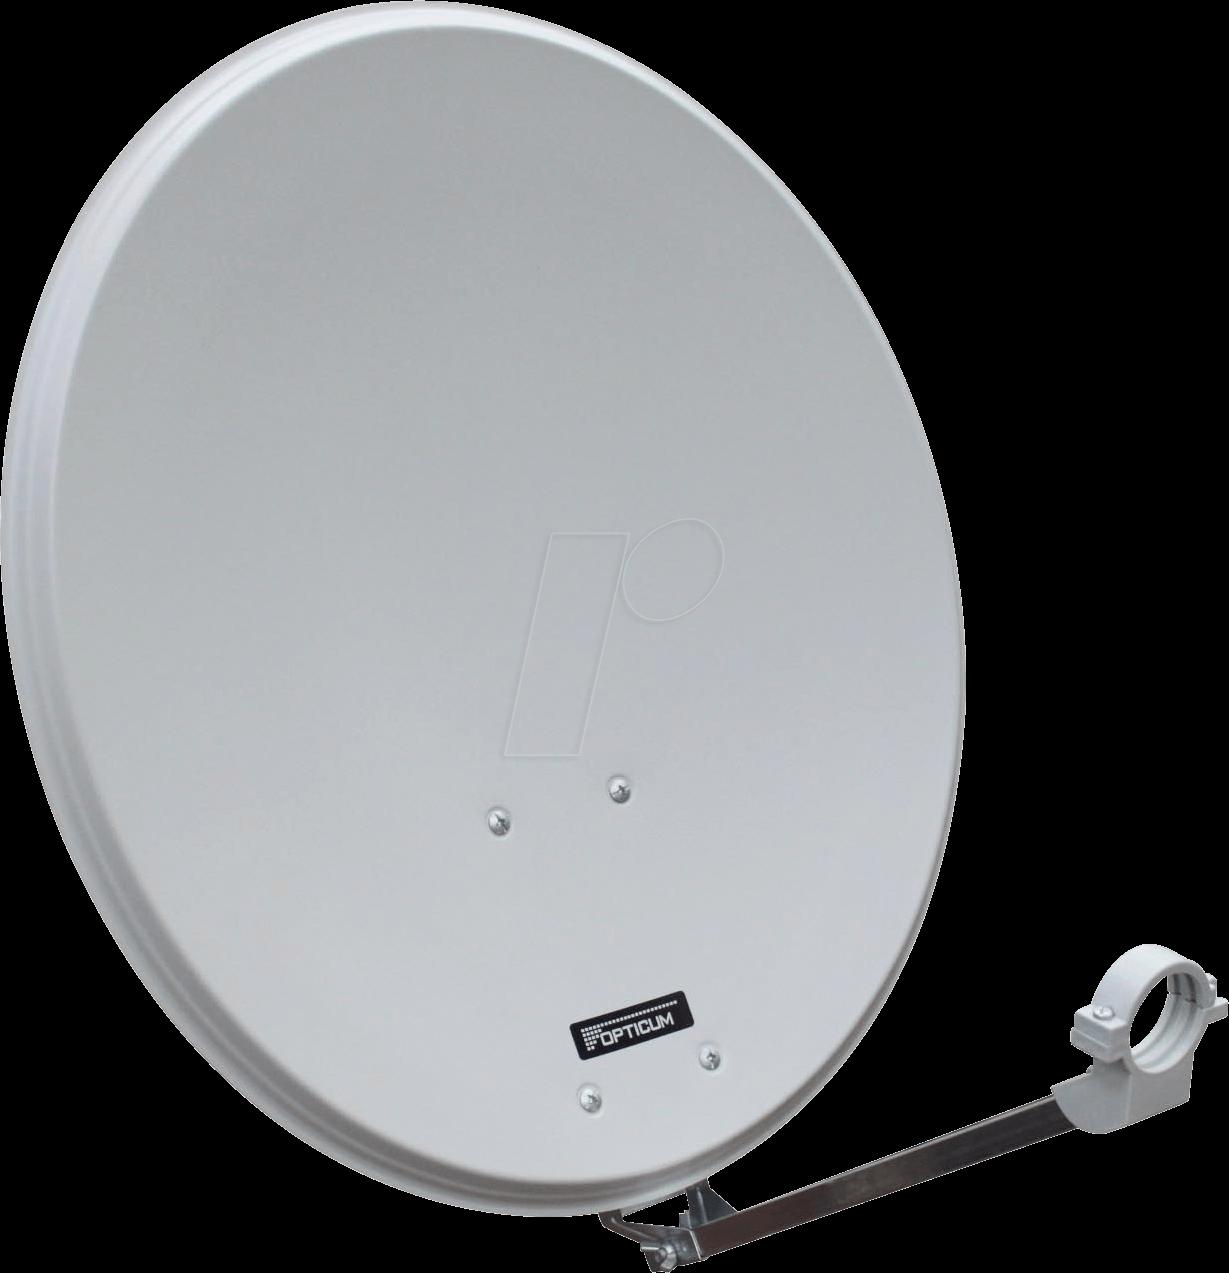 OPTICUM 9124 - Steel satellite dish, light grey, single LNB